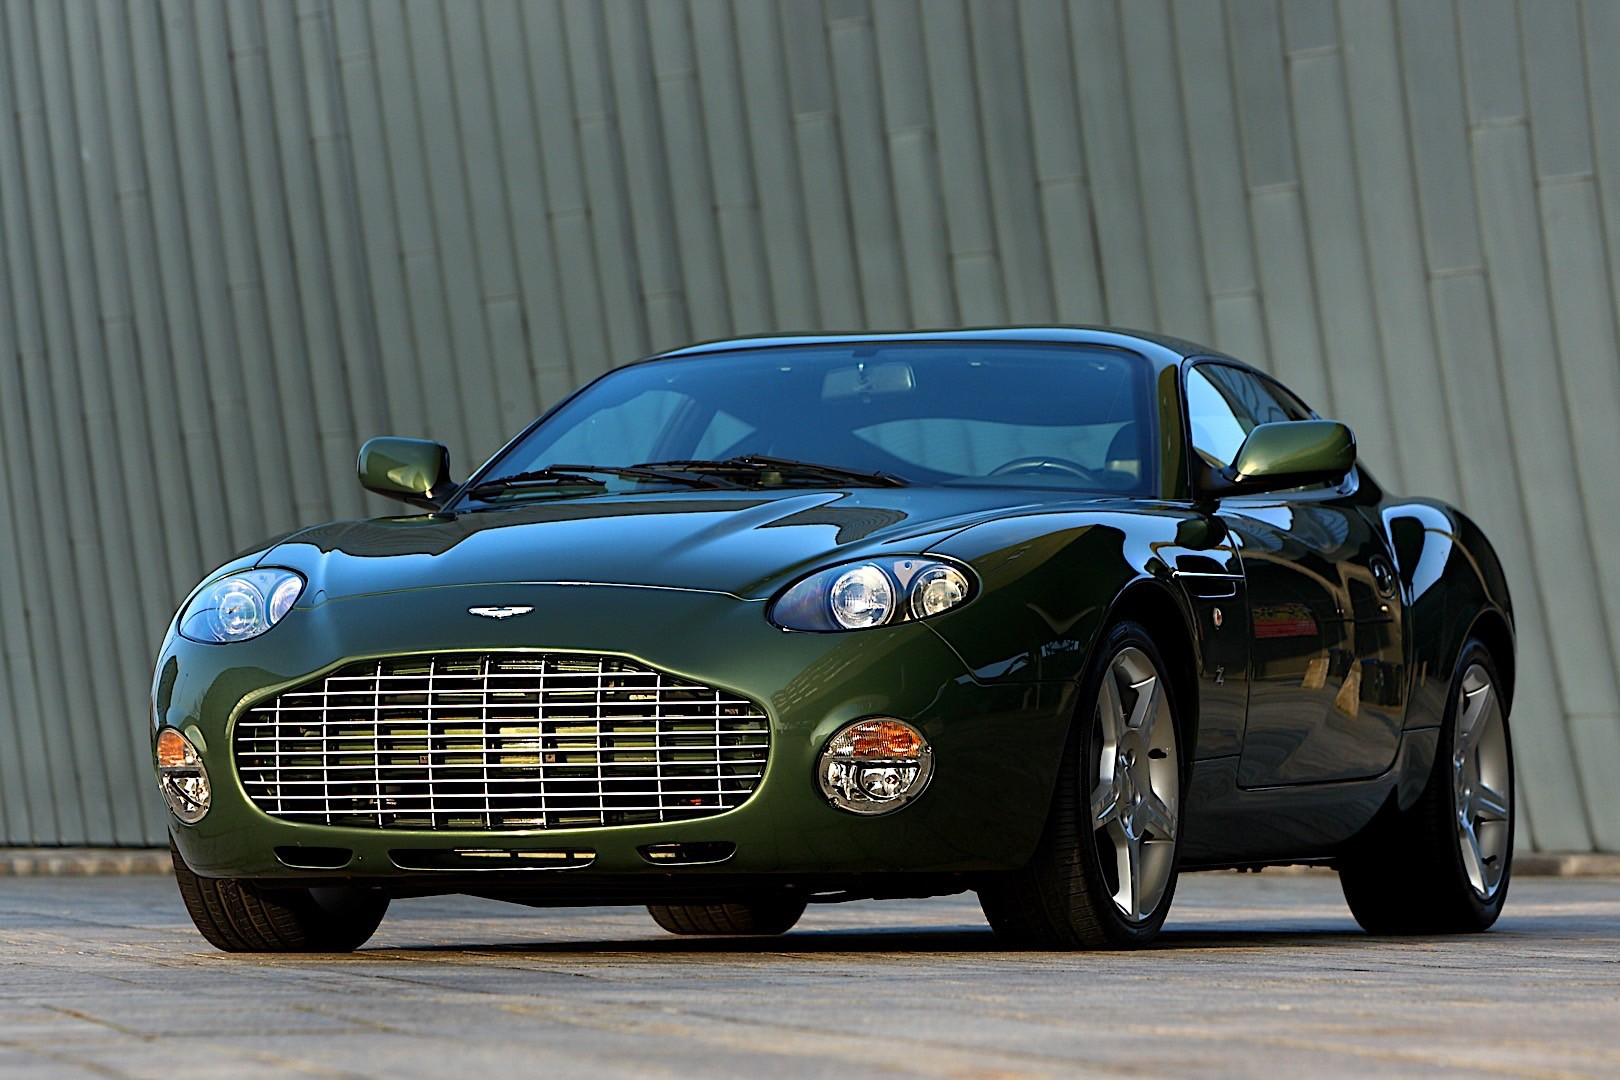 Aston Martin Db4 >> ASTON MARTIN DB7 Zagato specs - 2003 - autoevolution